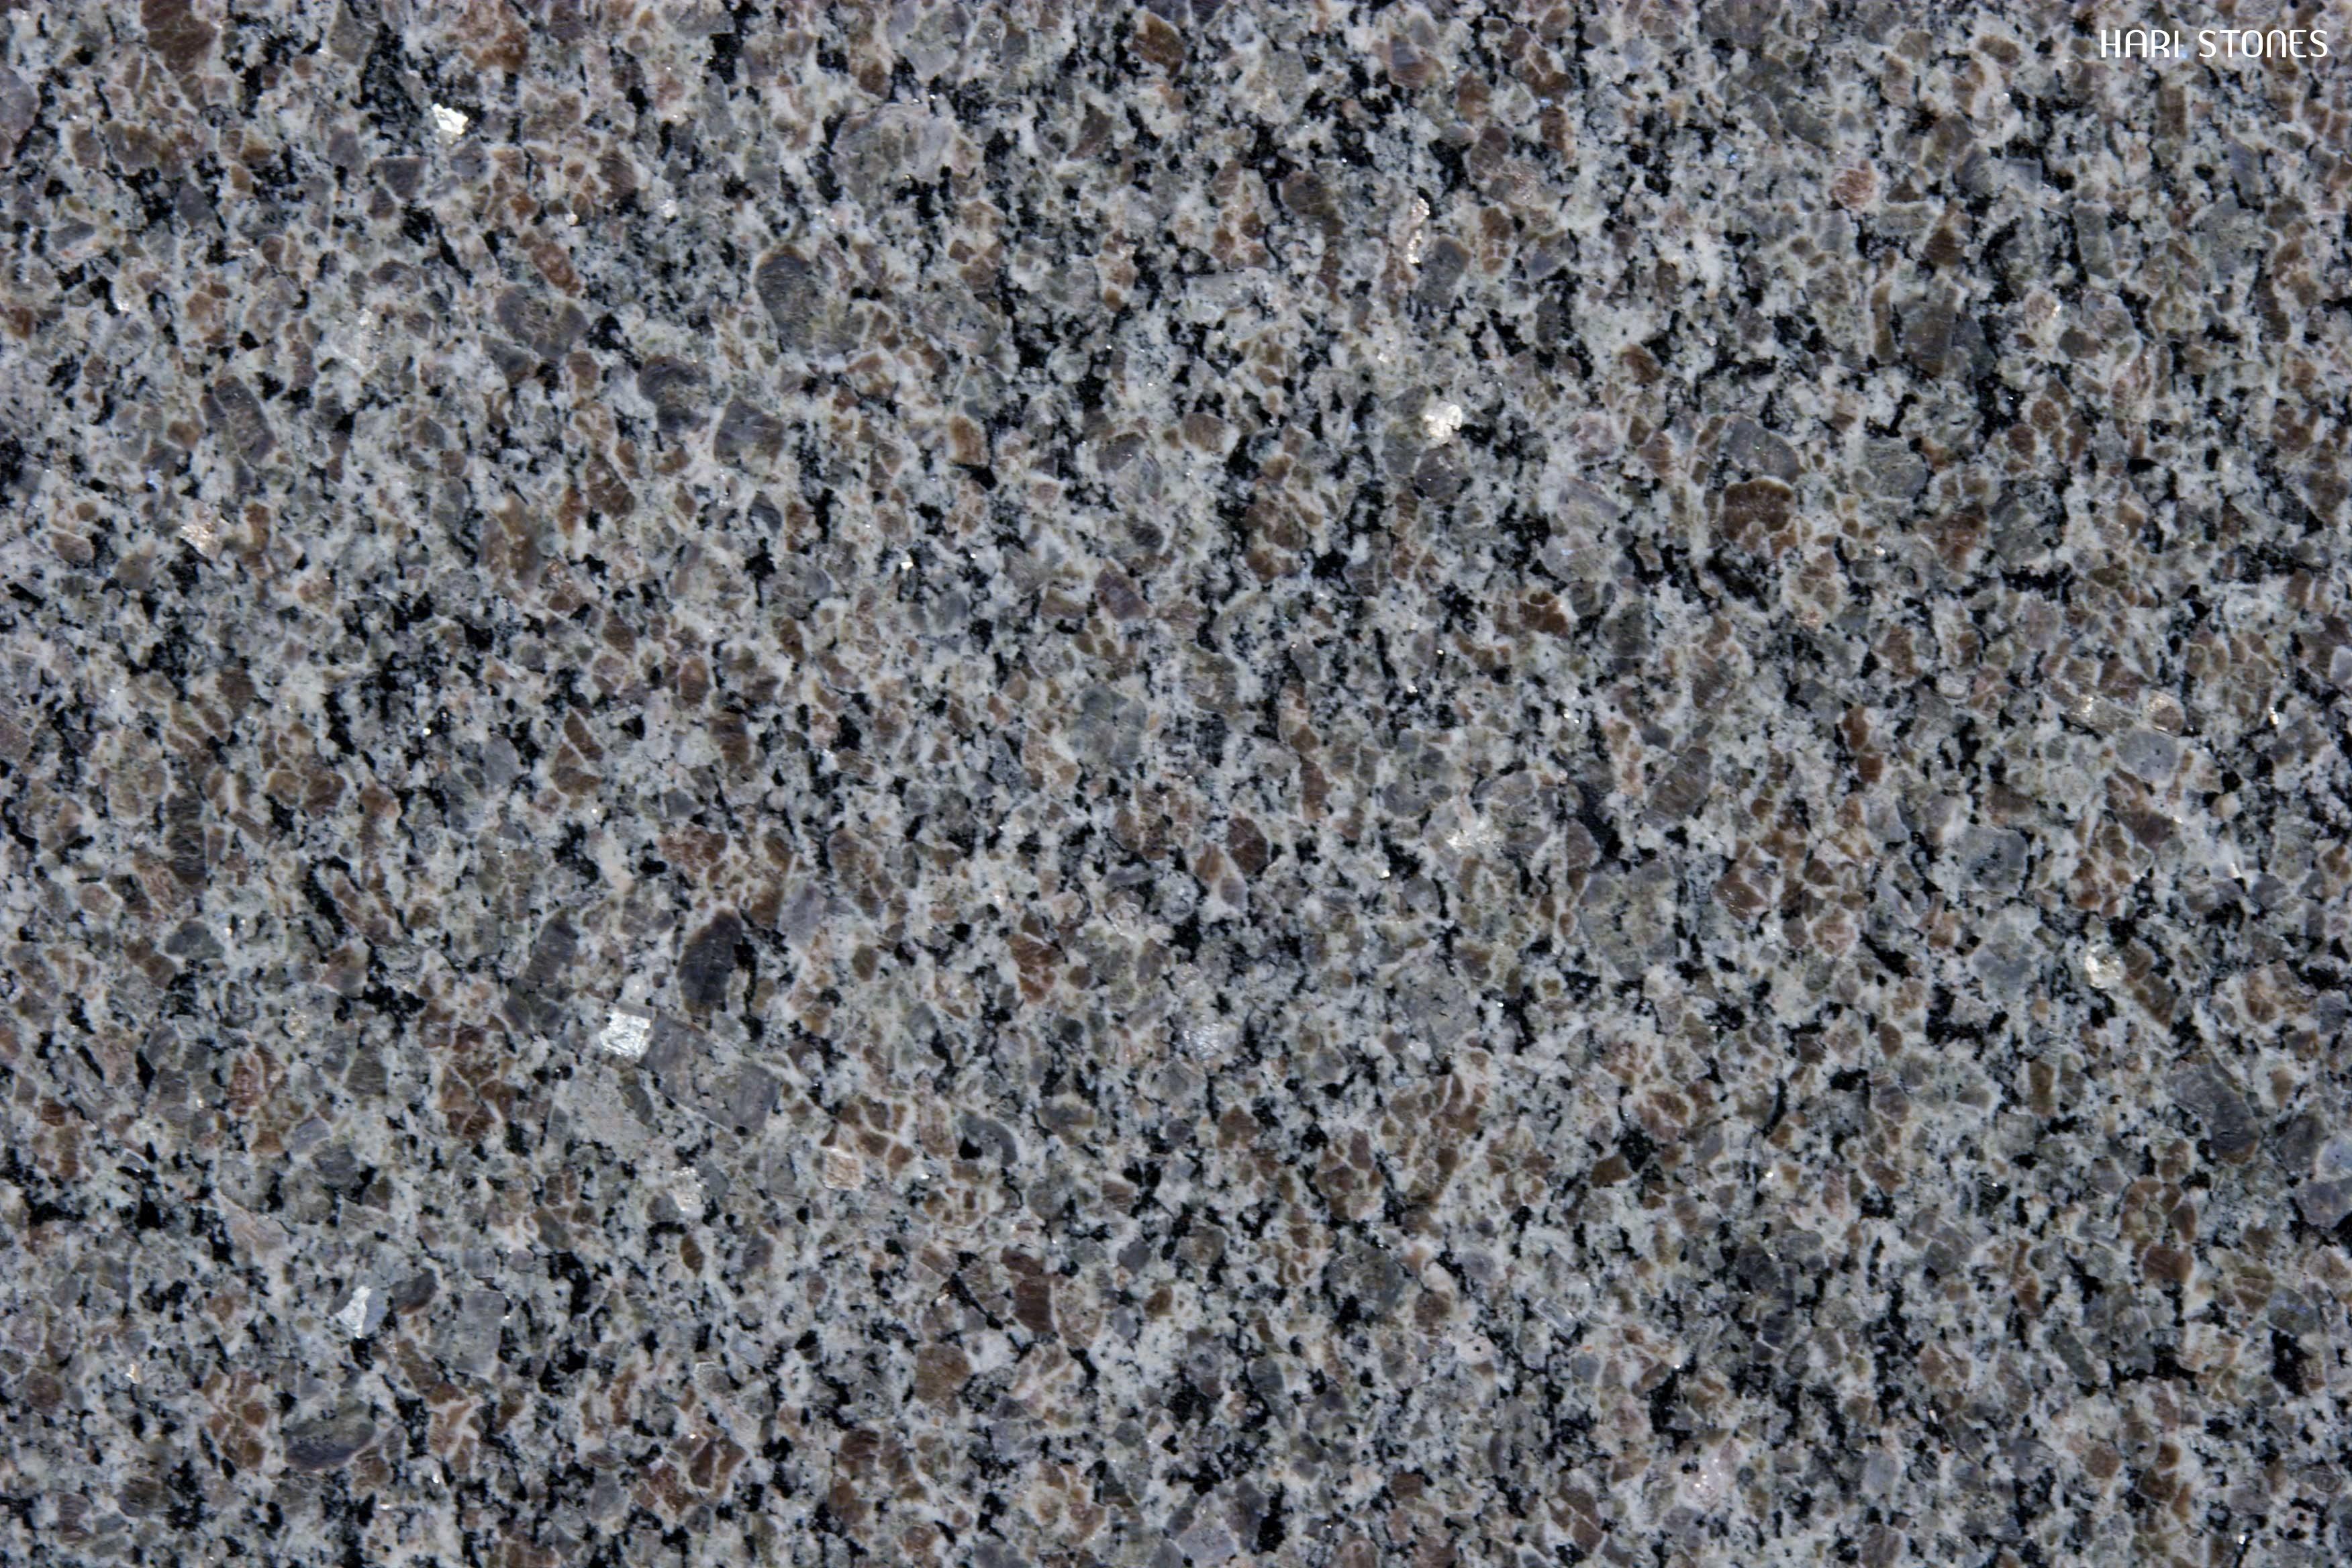 New Caledonia Granite Slabs Suppliers and Distributors